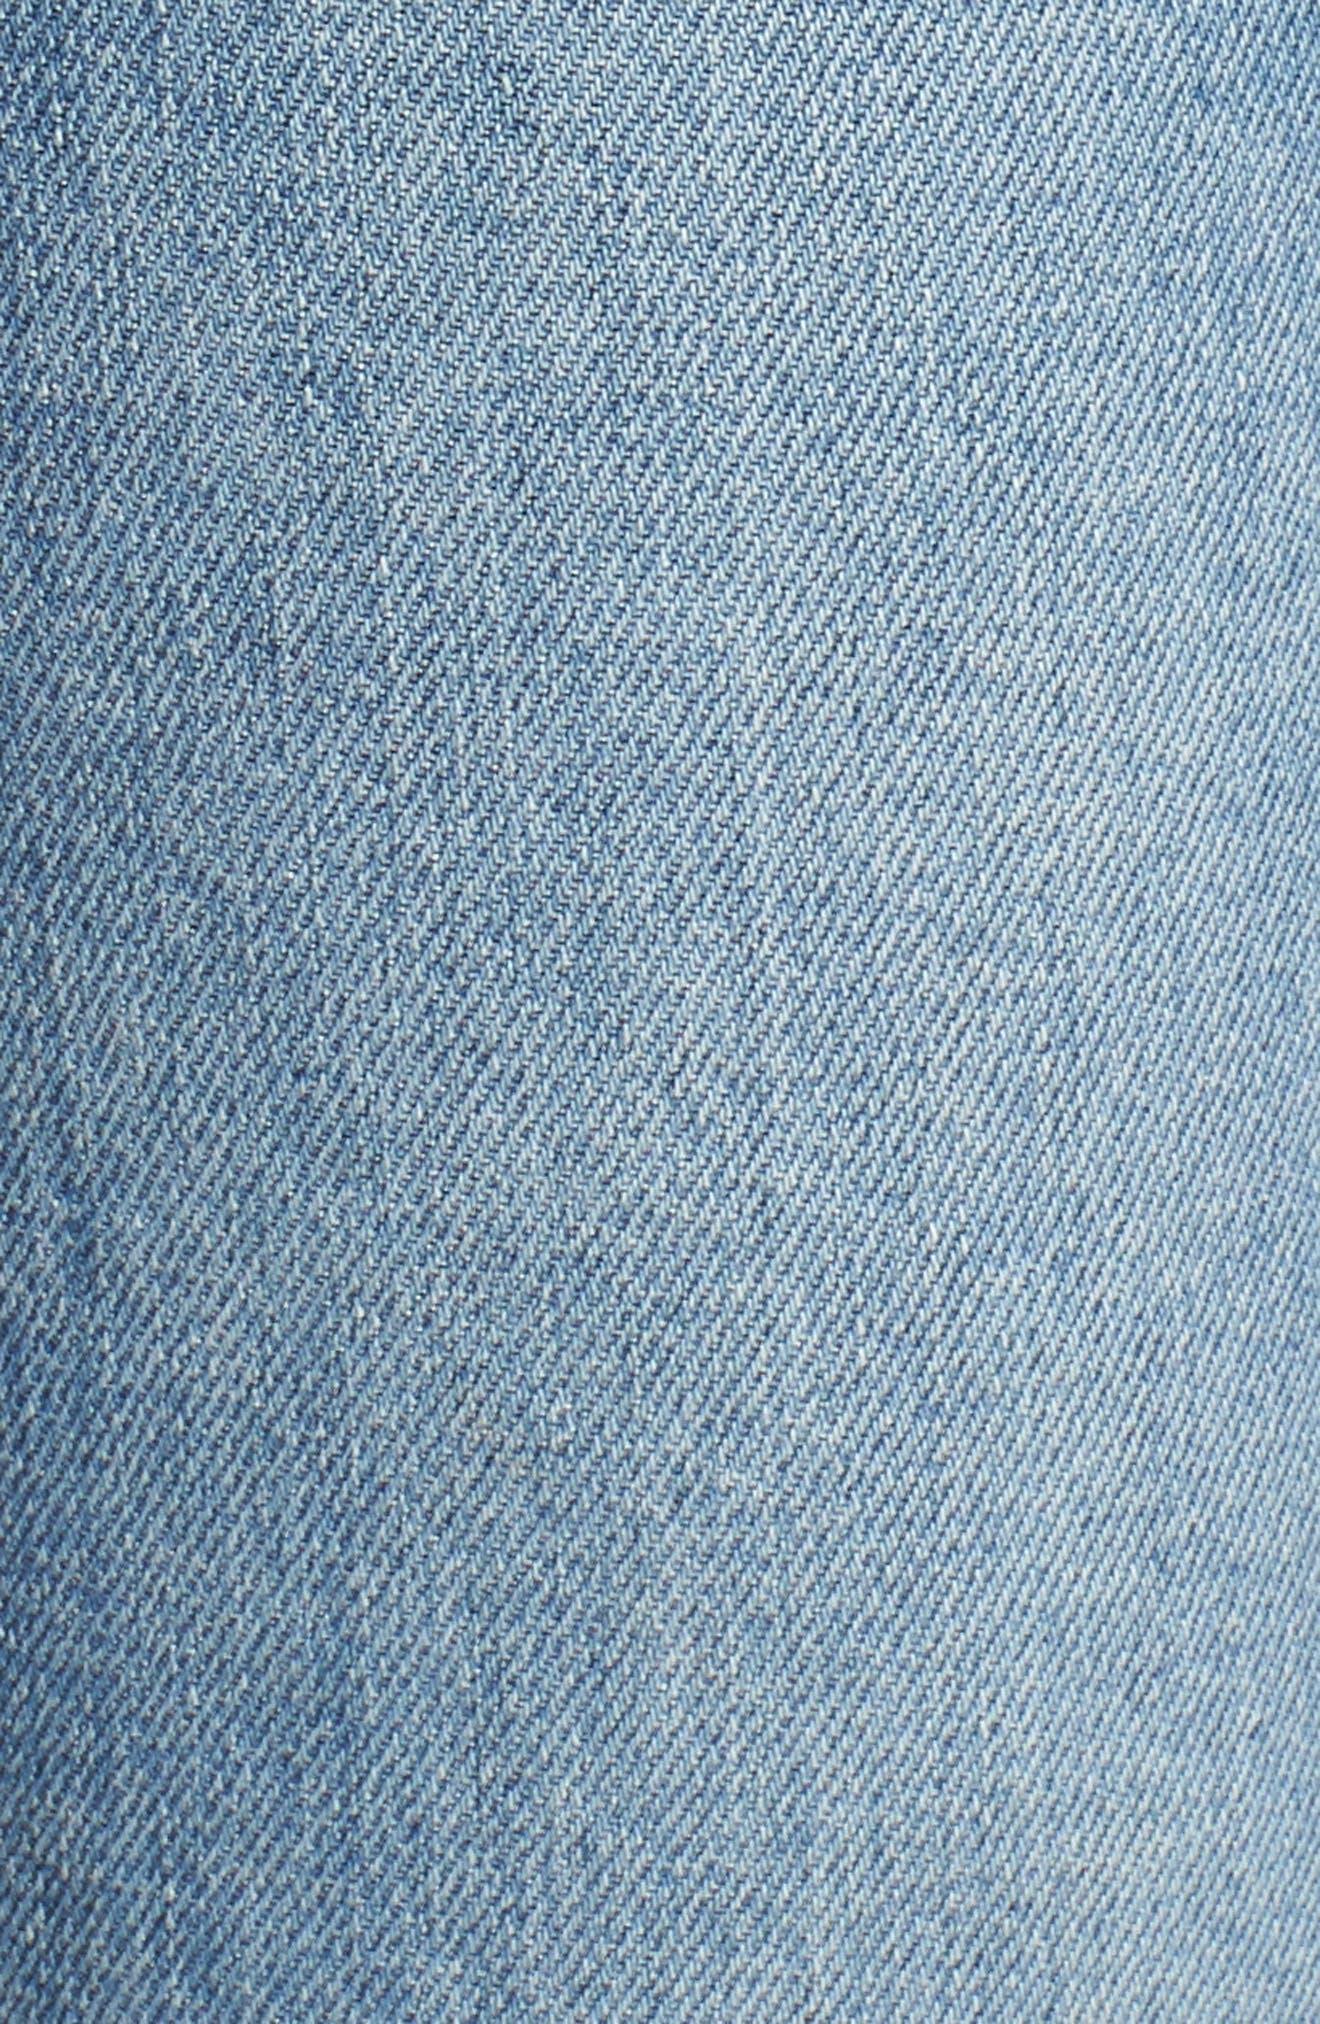 Edie High Waist Crop Straight Leg Jeans,                             Alternate thumbnail 21, color,